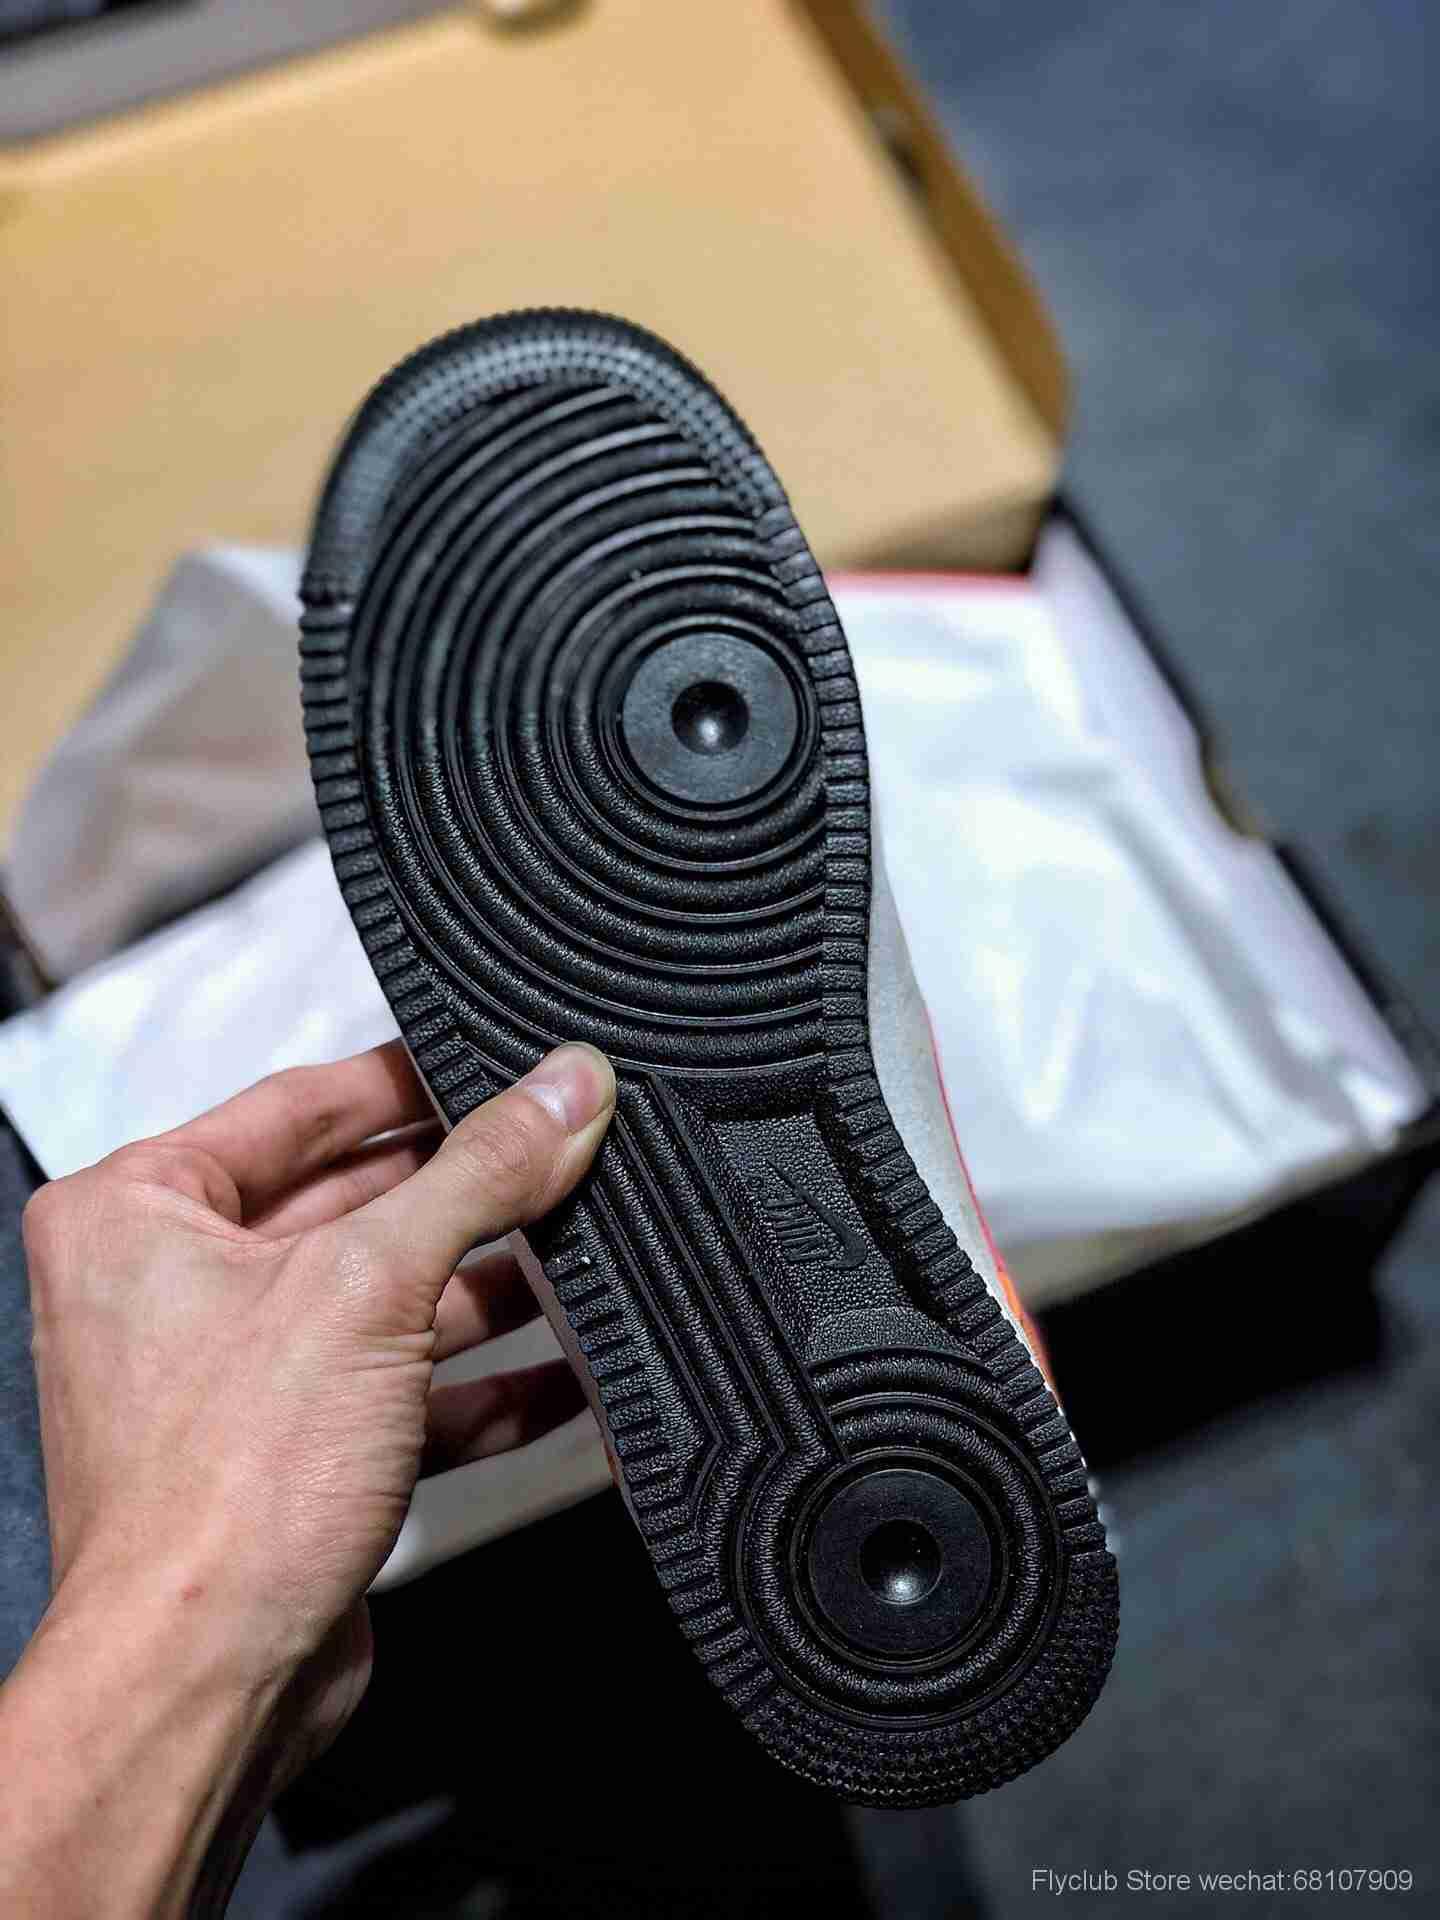 🔺Nike Air Force 1 '07 LV8 2 空军一号低帮休闲运动板鞋 CD0887-100